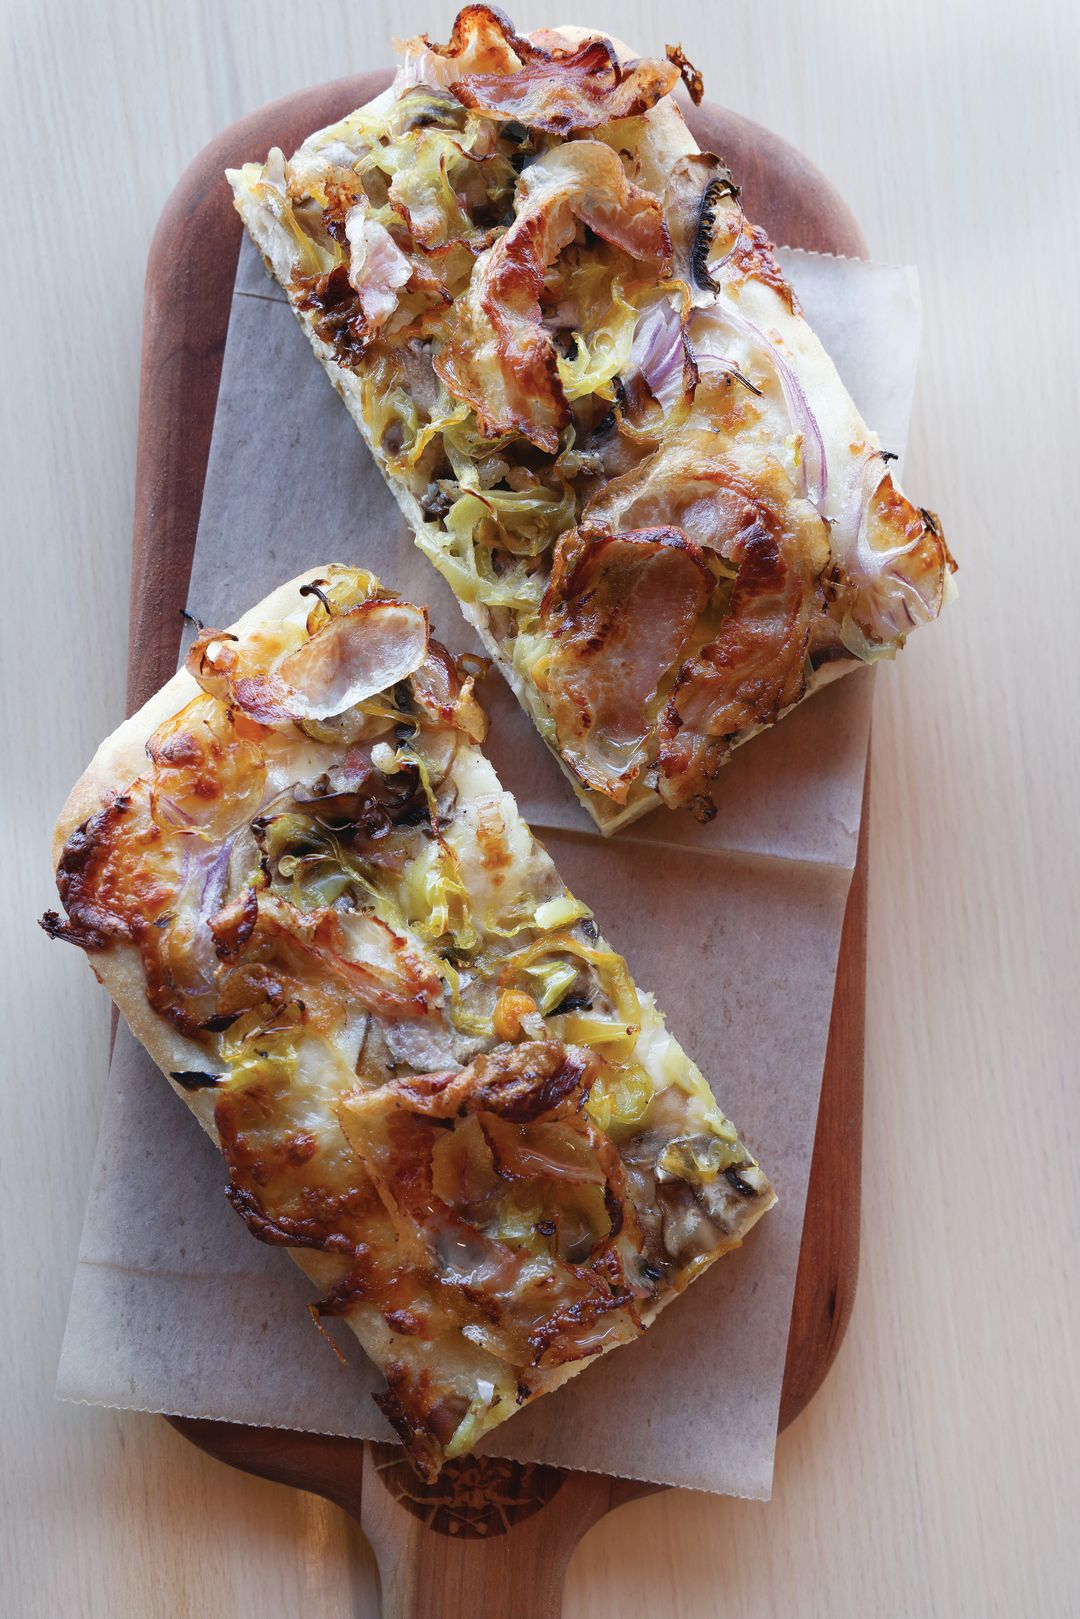 RomanSQ's fra diavolo pizza